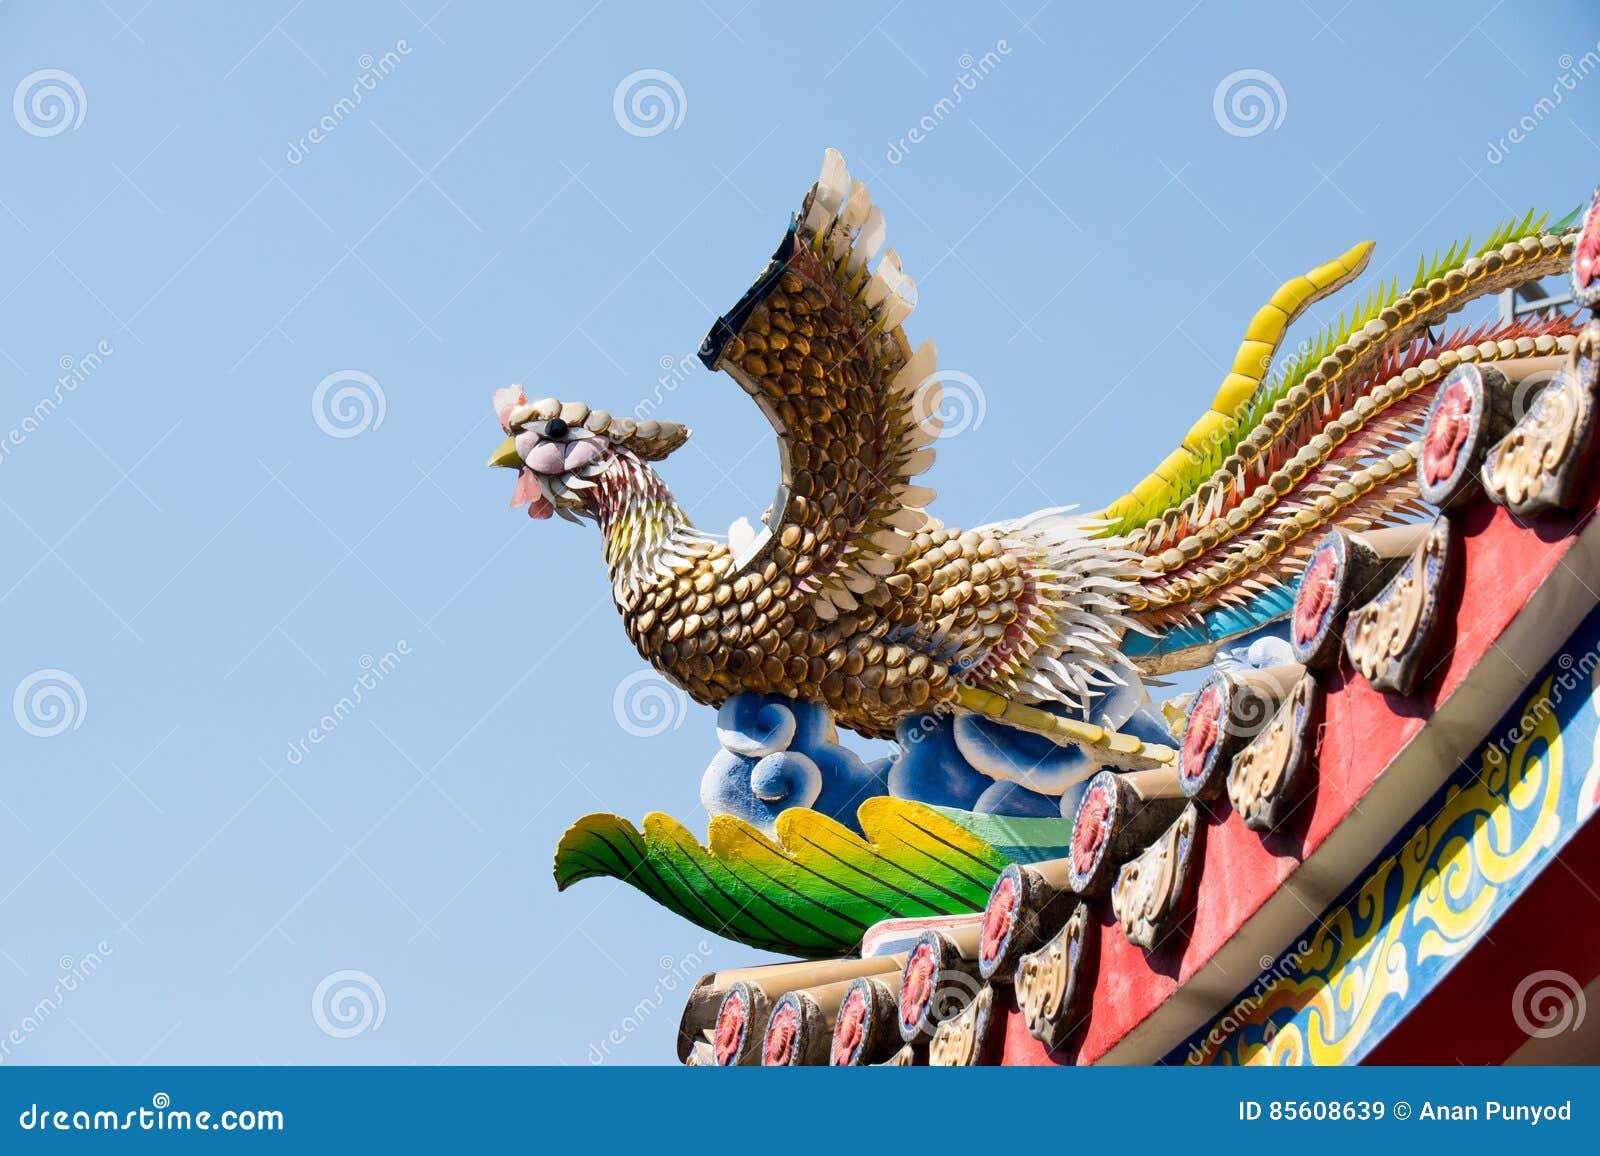 Traditioneel Chinees Ceramisch vogelbeeldhouwwerk op Dakheiligdom